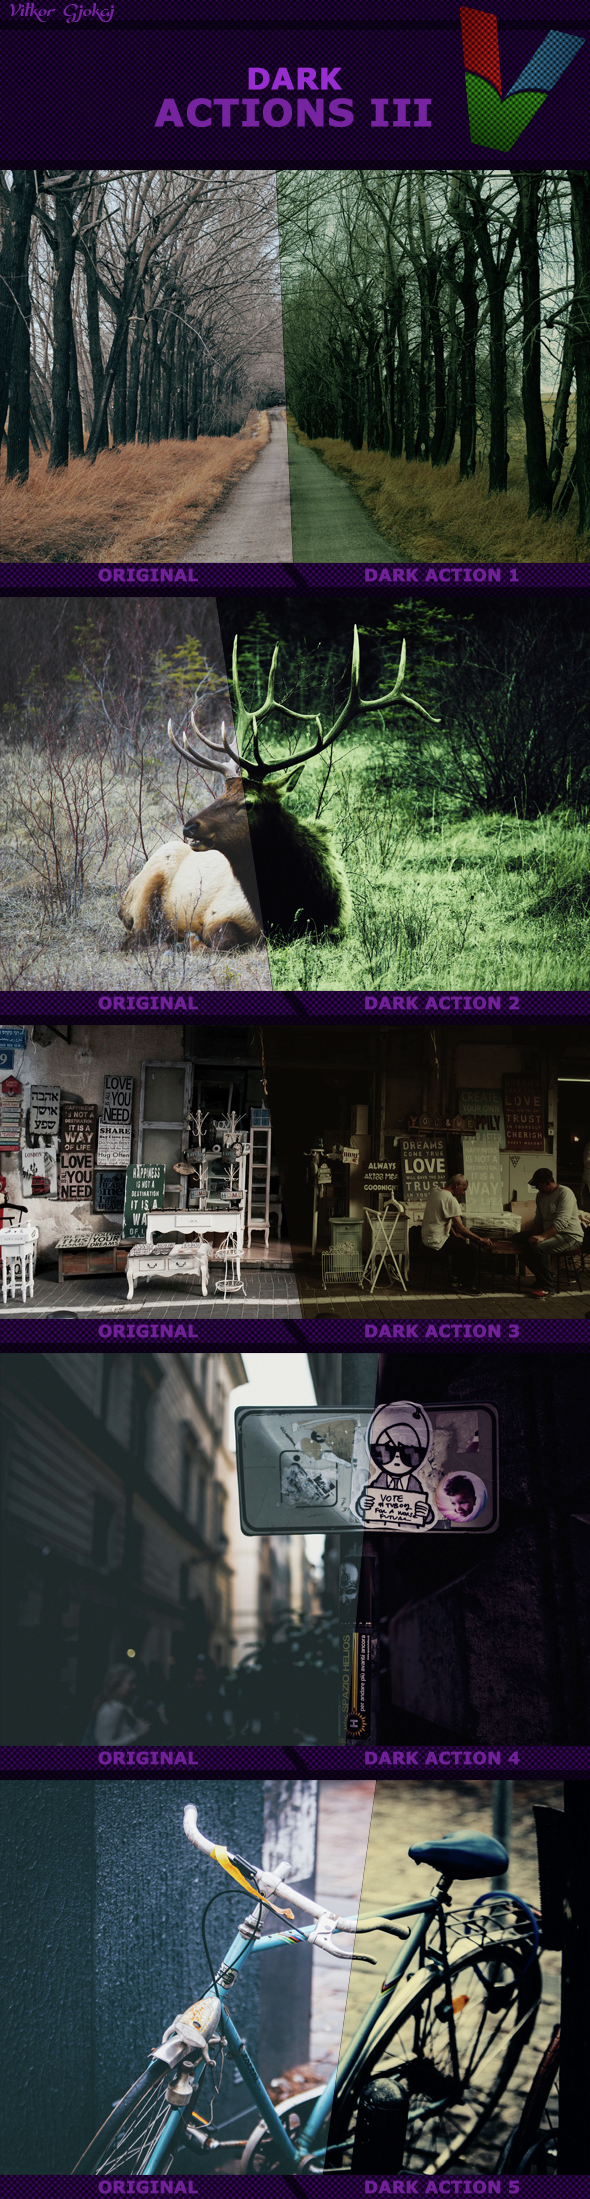 Dark Actions III - Photo Effects Actions